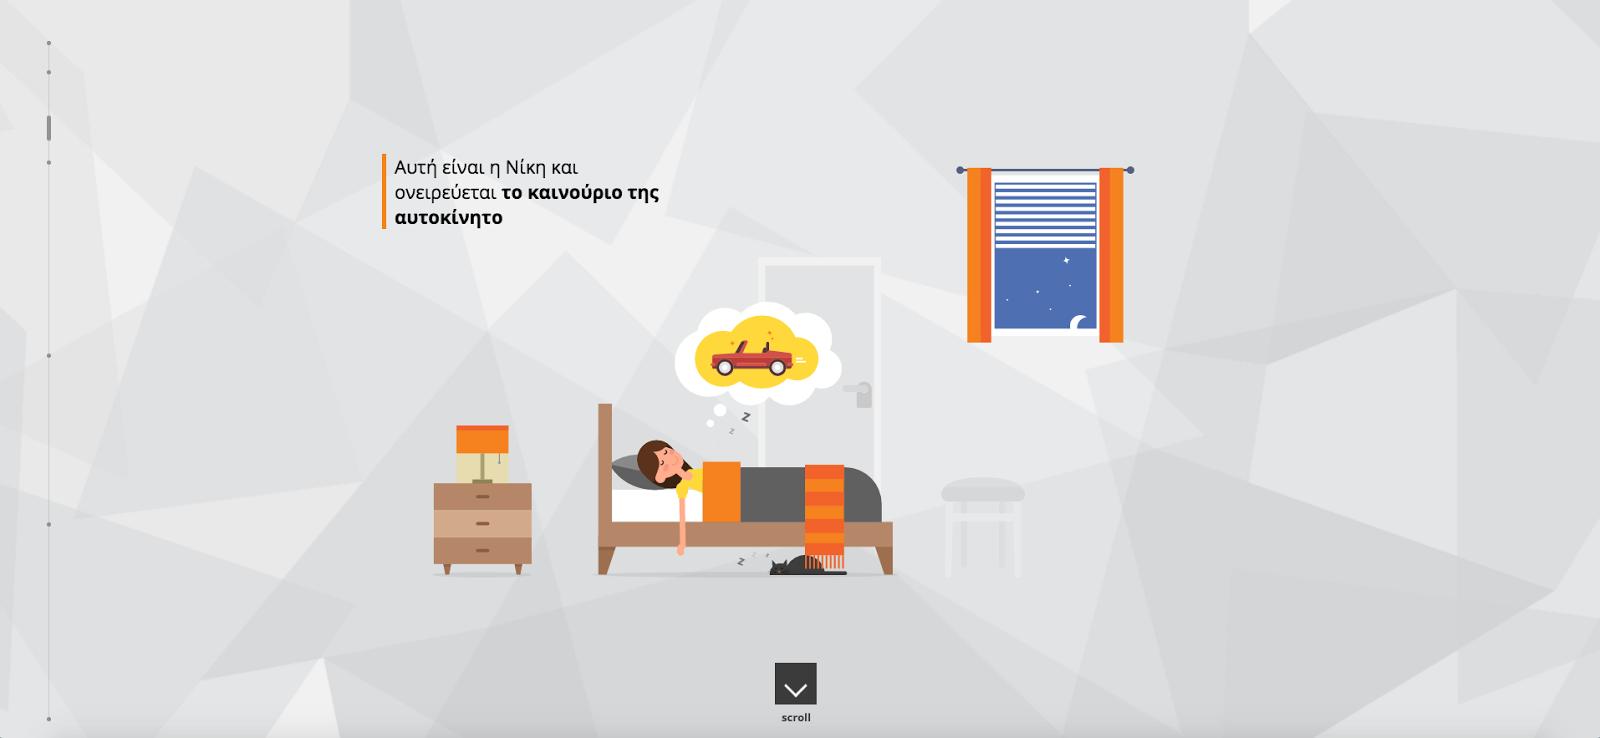 httpleaseplanstories.gr 2 Λύστε κάθε απορία για το leasing με τον πιο διασκεδαστικό τρόπο!